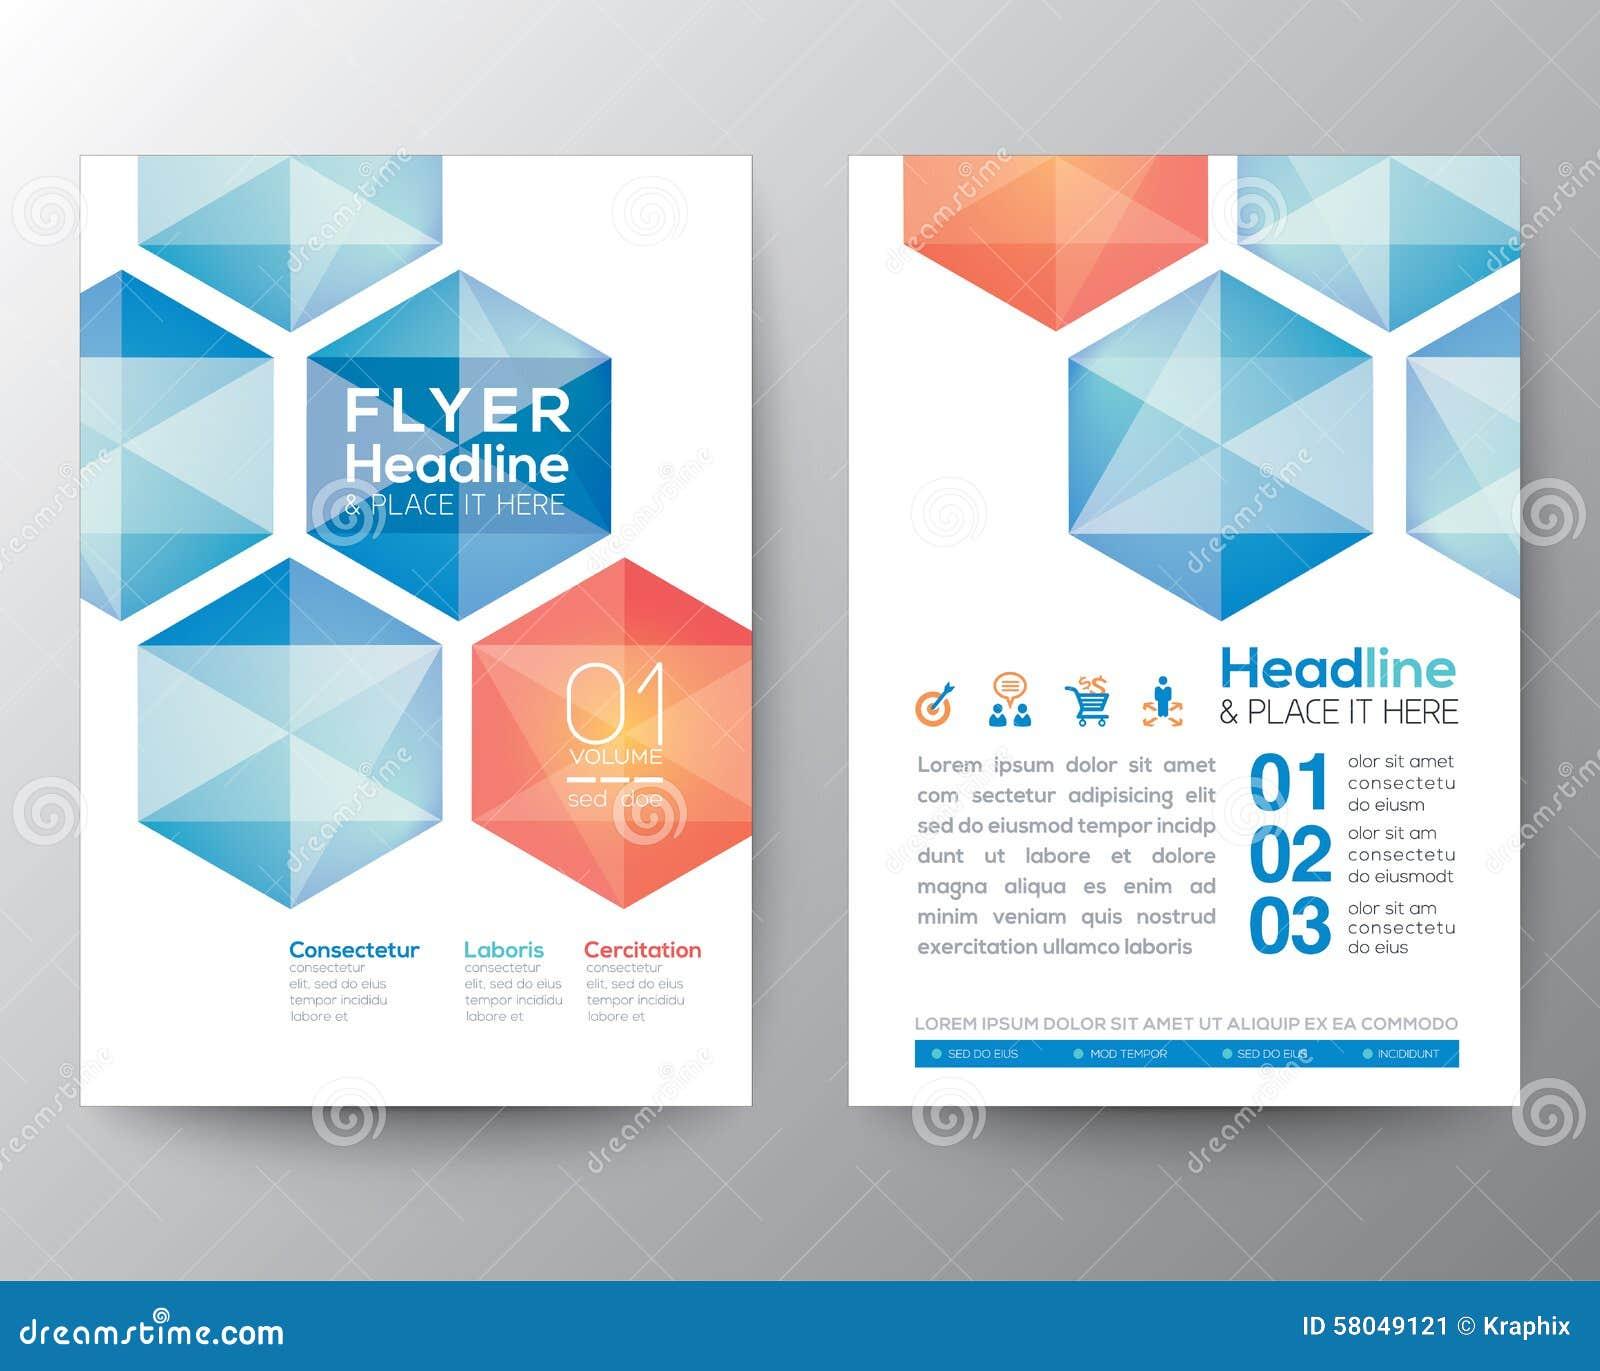 Mockup Interior Design Abstract Hexagon Poster Brochure Flyer Design Template